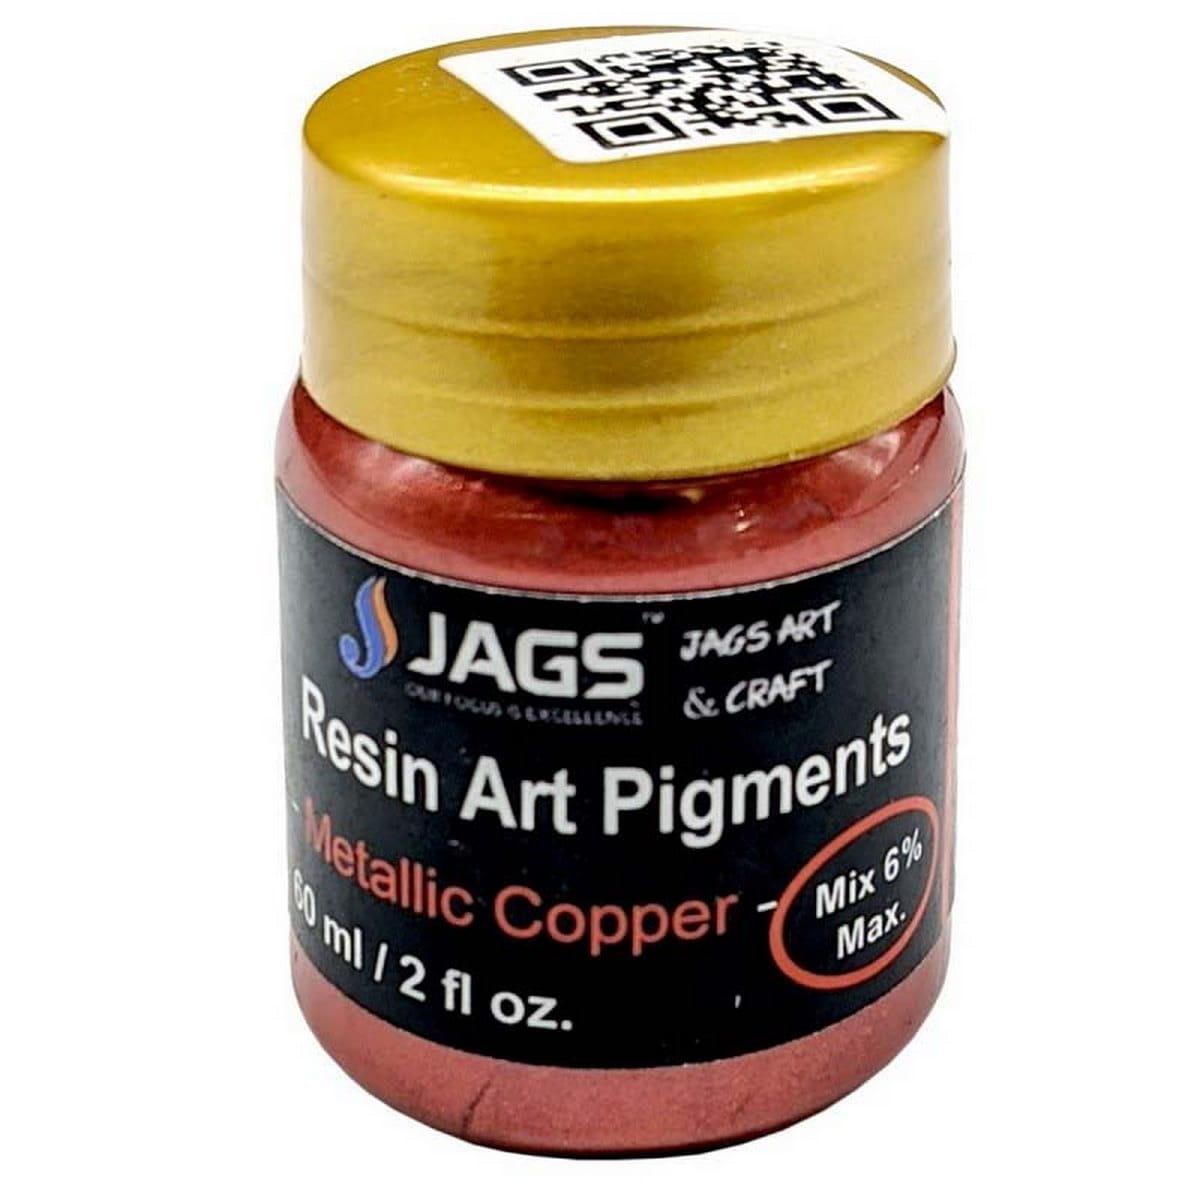 Resin Art Pigments Metallic Copper